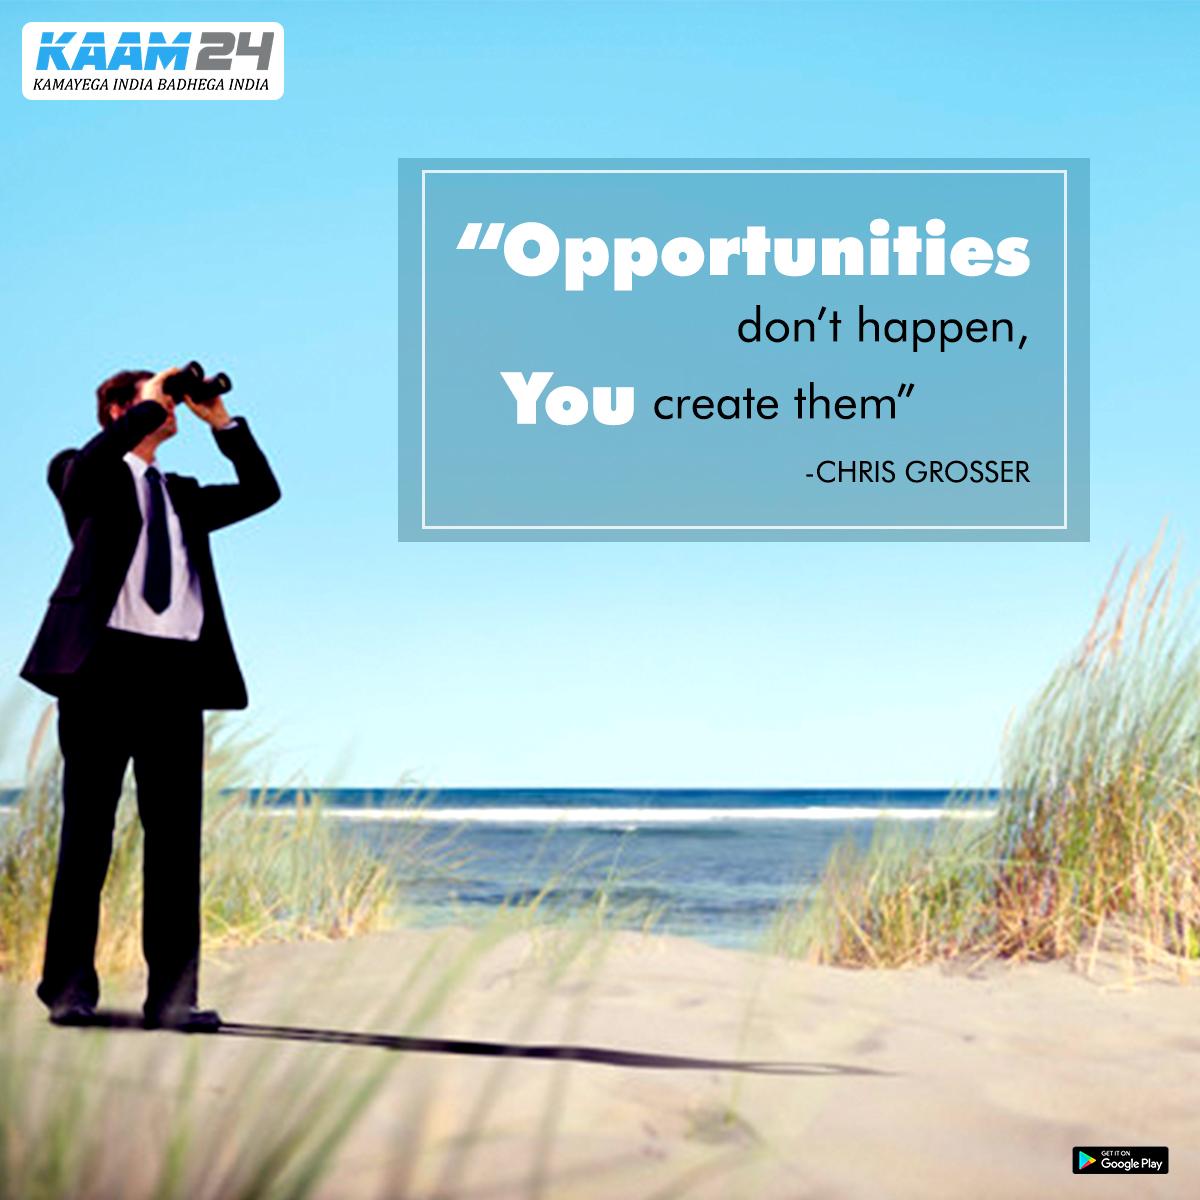 """Opportunities Don't Happen, You Create Them""                                                        _CHRIS GROSSER ✍ ● ● ● #chrisgrosser #kaam24   #motivation #inspiration #love #life #motivationalquotes #quotes #mindset #believe #goals #lifestyle #positivevibes #happiness"